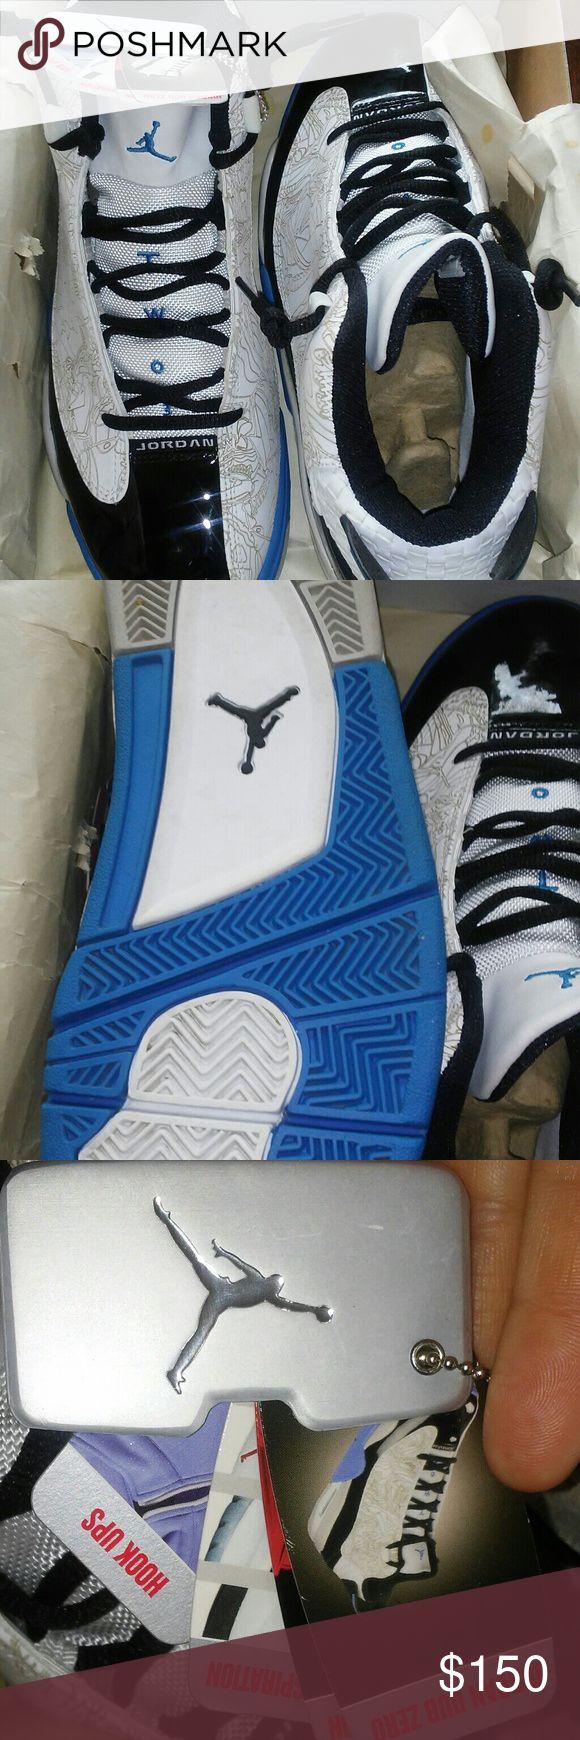 Air jordan dub zero White black and photo blue used few times like new Air Jordan Shoes